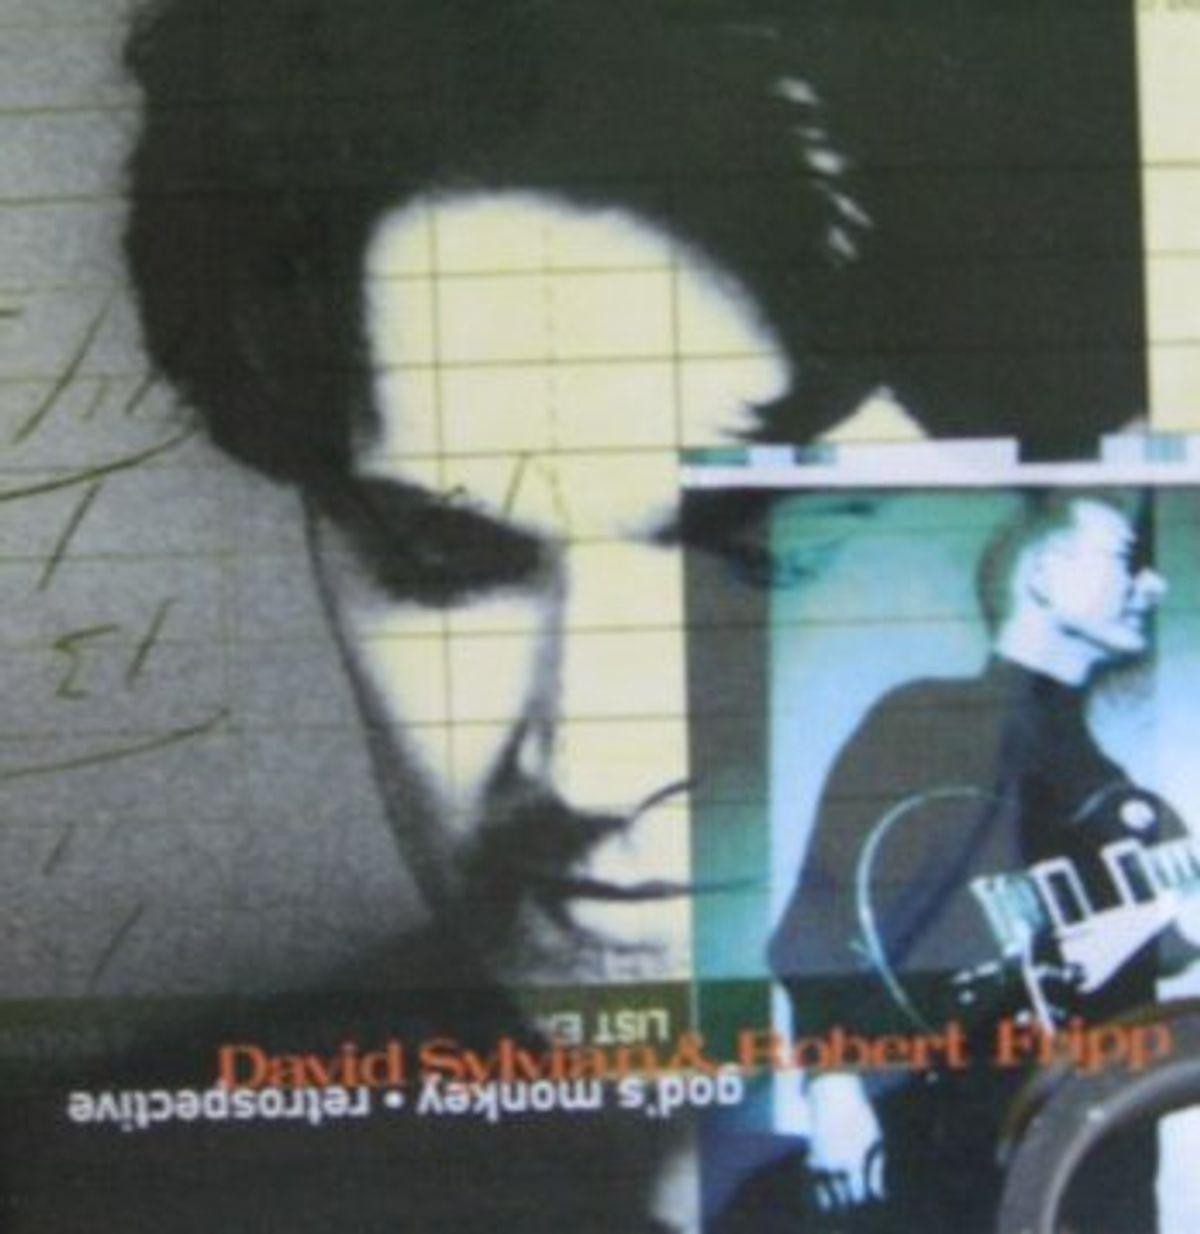 #DavidSylvian - David Sylvian & Robert Fripp - God's Monkey (1993)